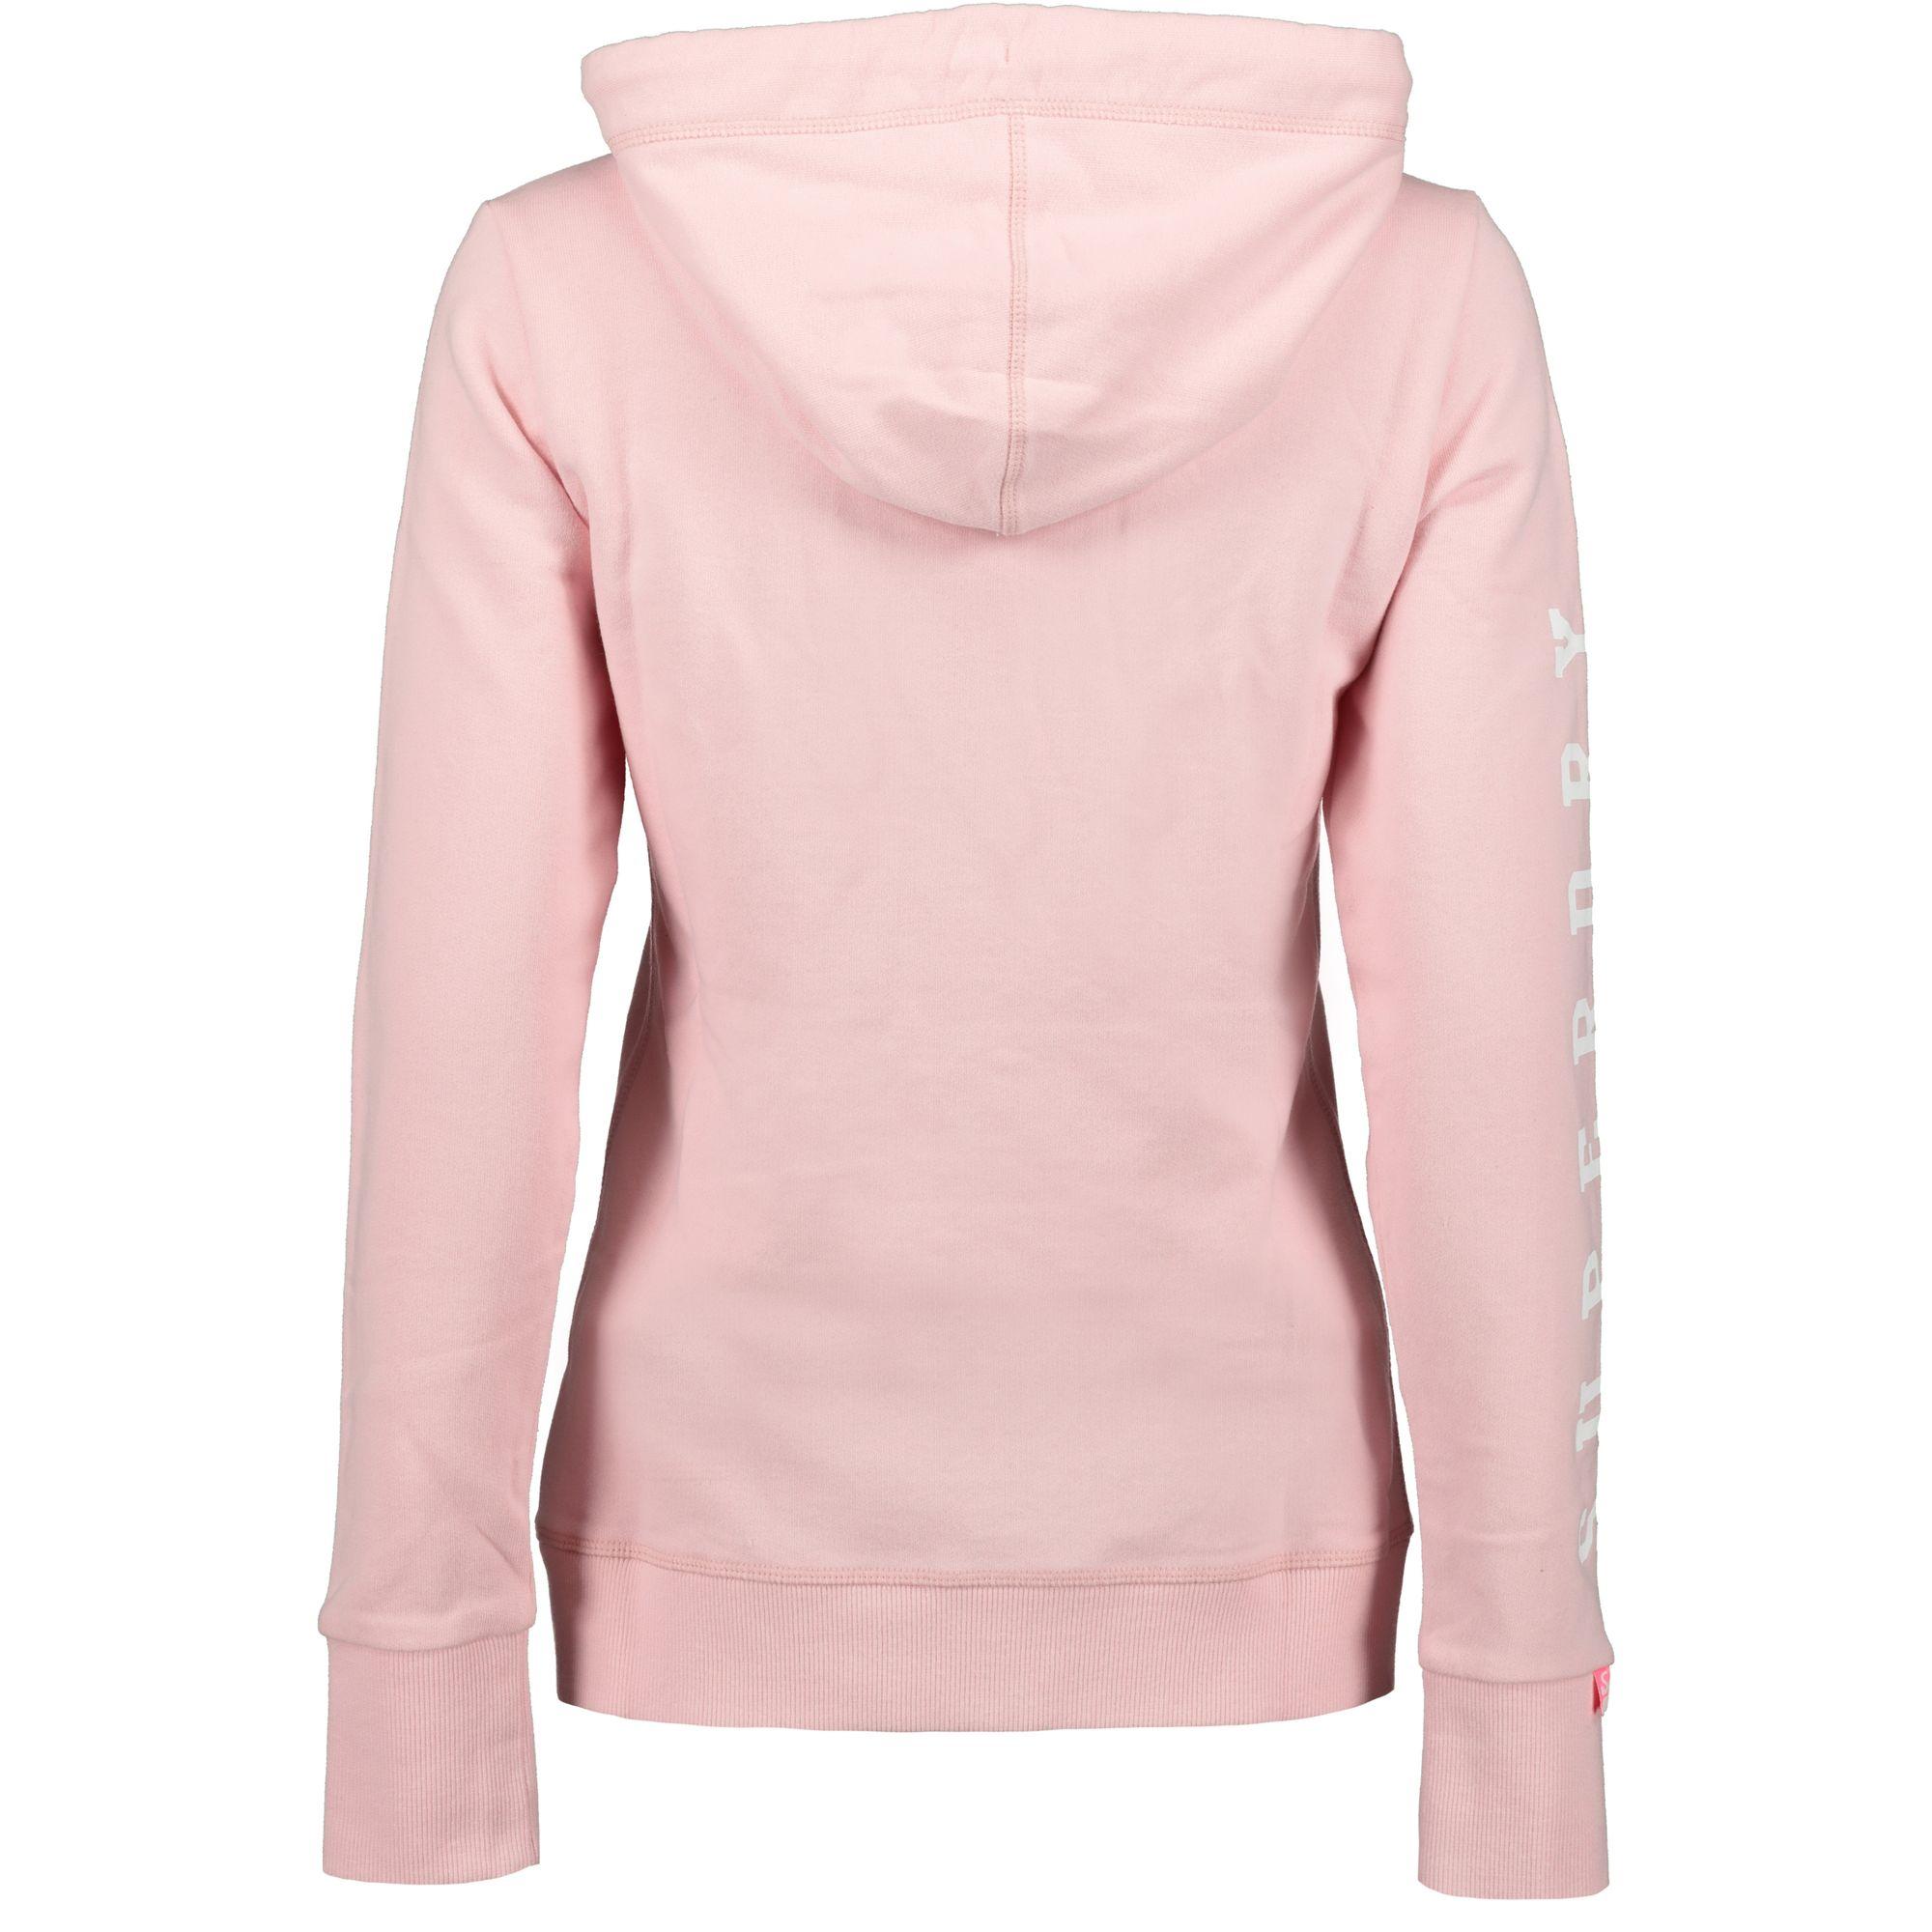 innovative design 93a72 2baa6 Superdry Track and Field Lite Ziphood Sweatjacke Damen fade pink